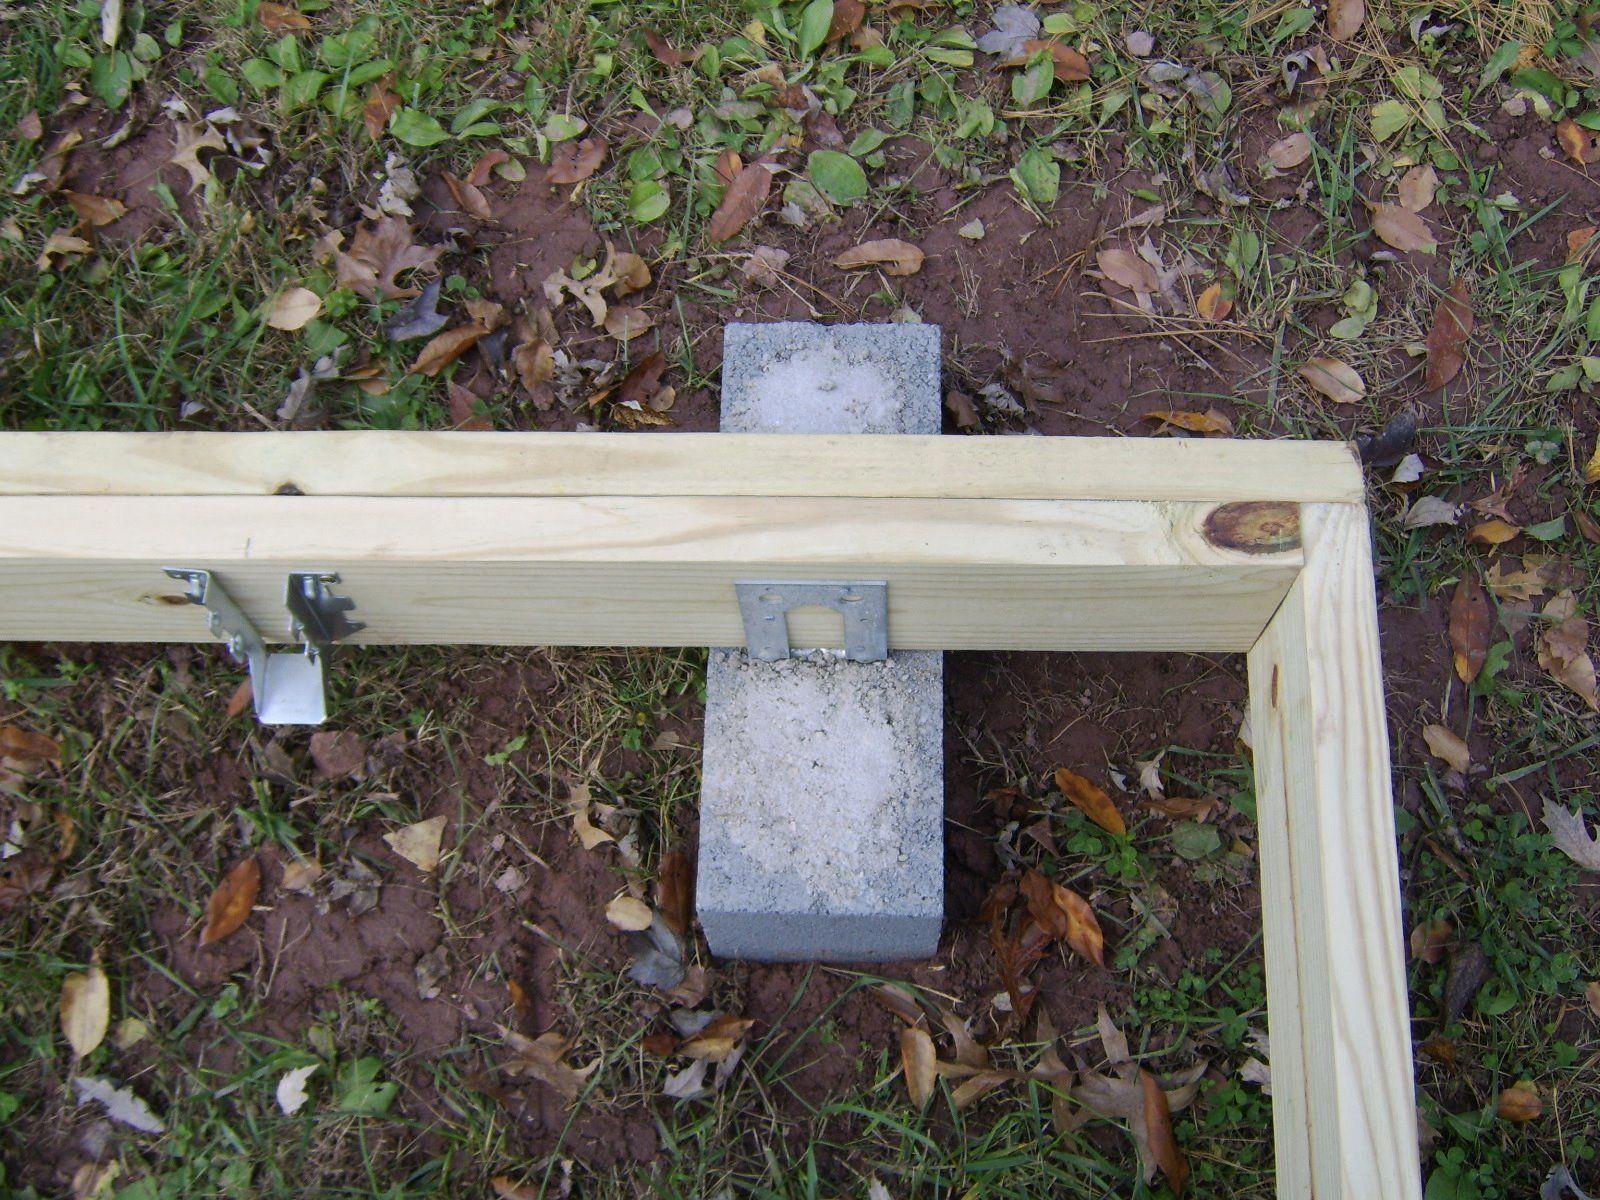 Neelapala building a ground level deck yourselves buildingadeck